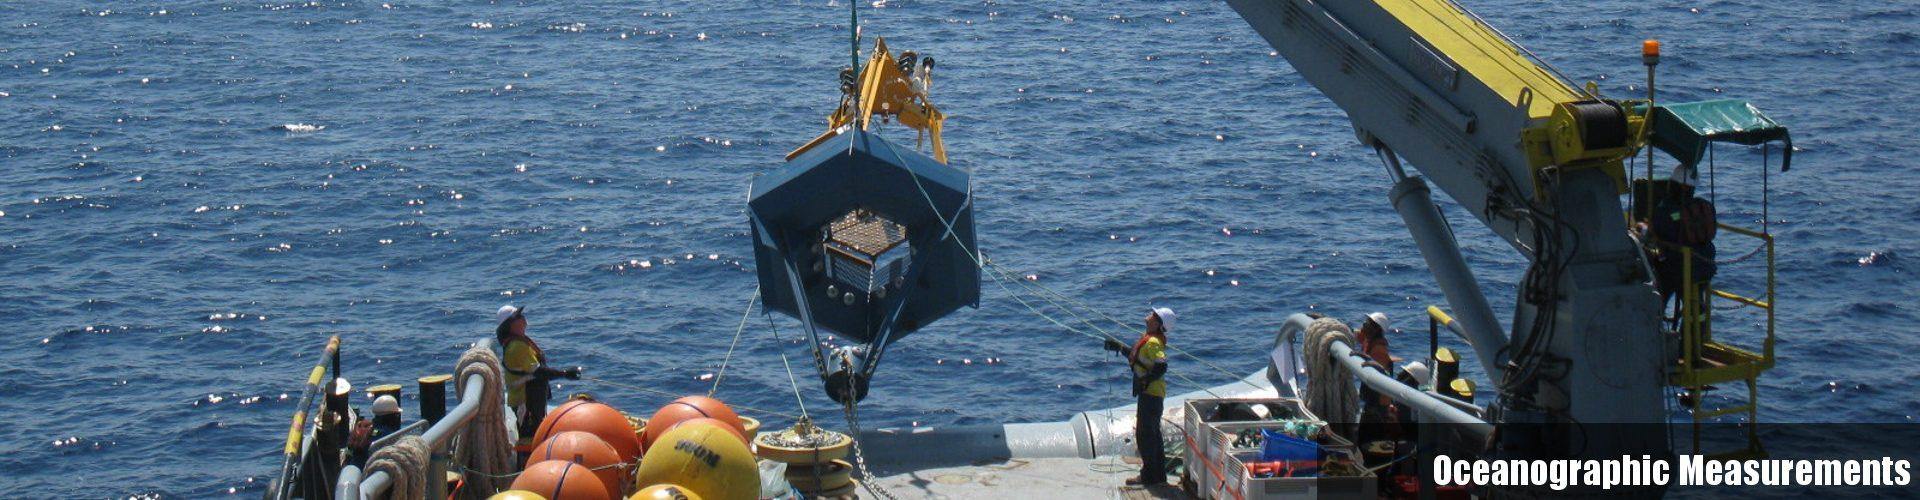 Permalink to: Oceanographic Measurements